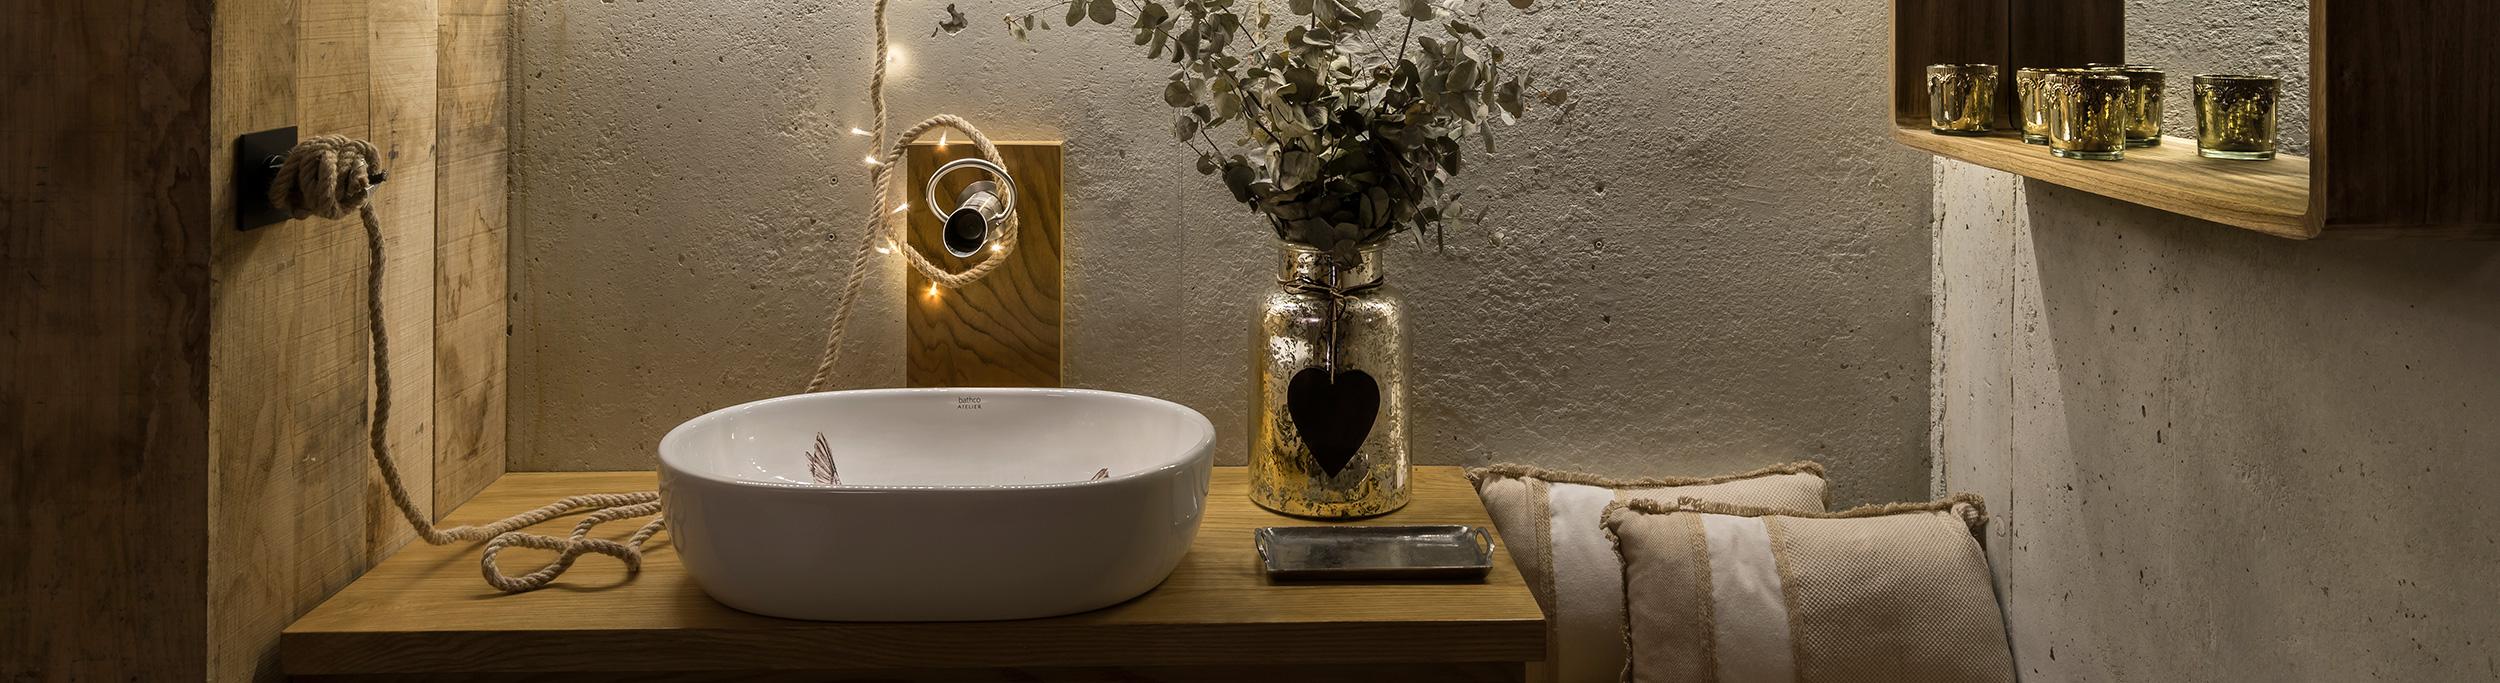 Baño realizado por Studio San Fernando con lavabo Bathco Atelier